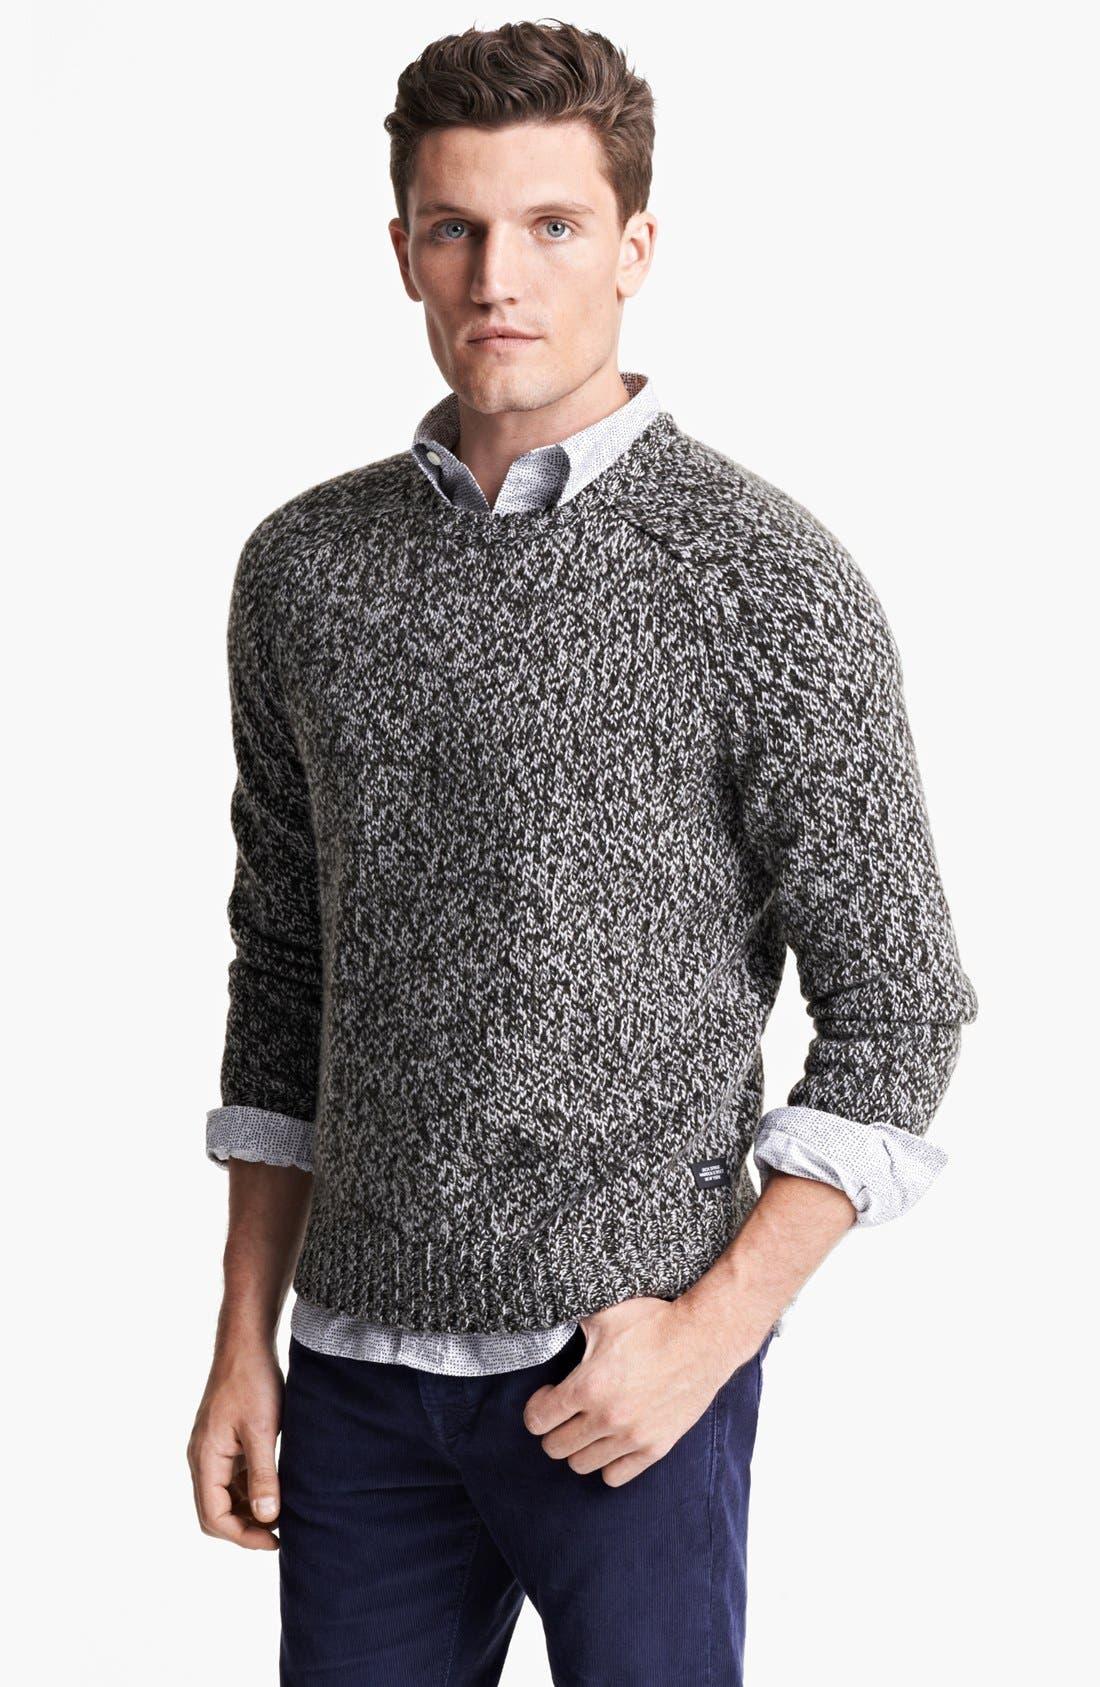 Main Image - Jack Spade 'Cameron' Marled Crewneck Sweater